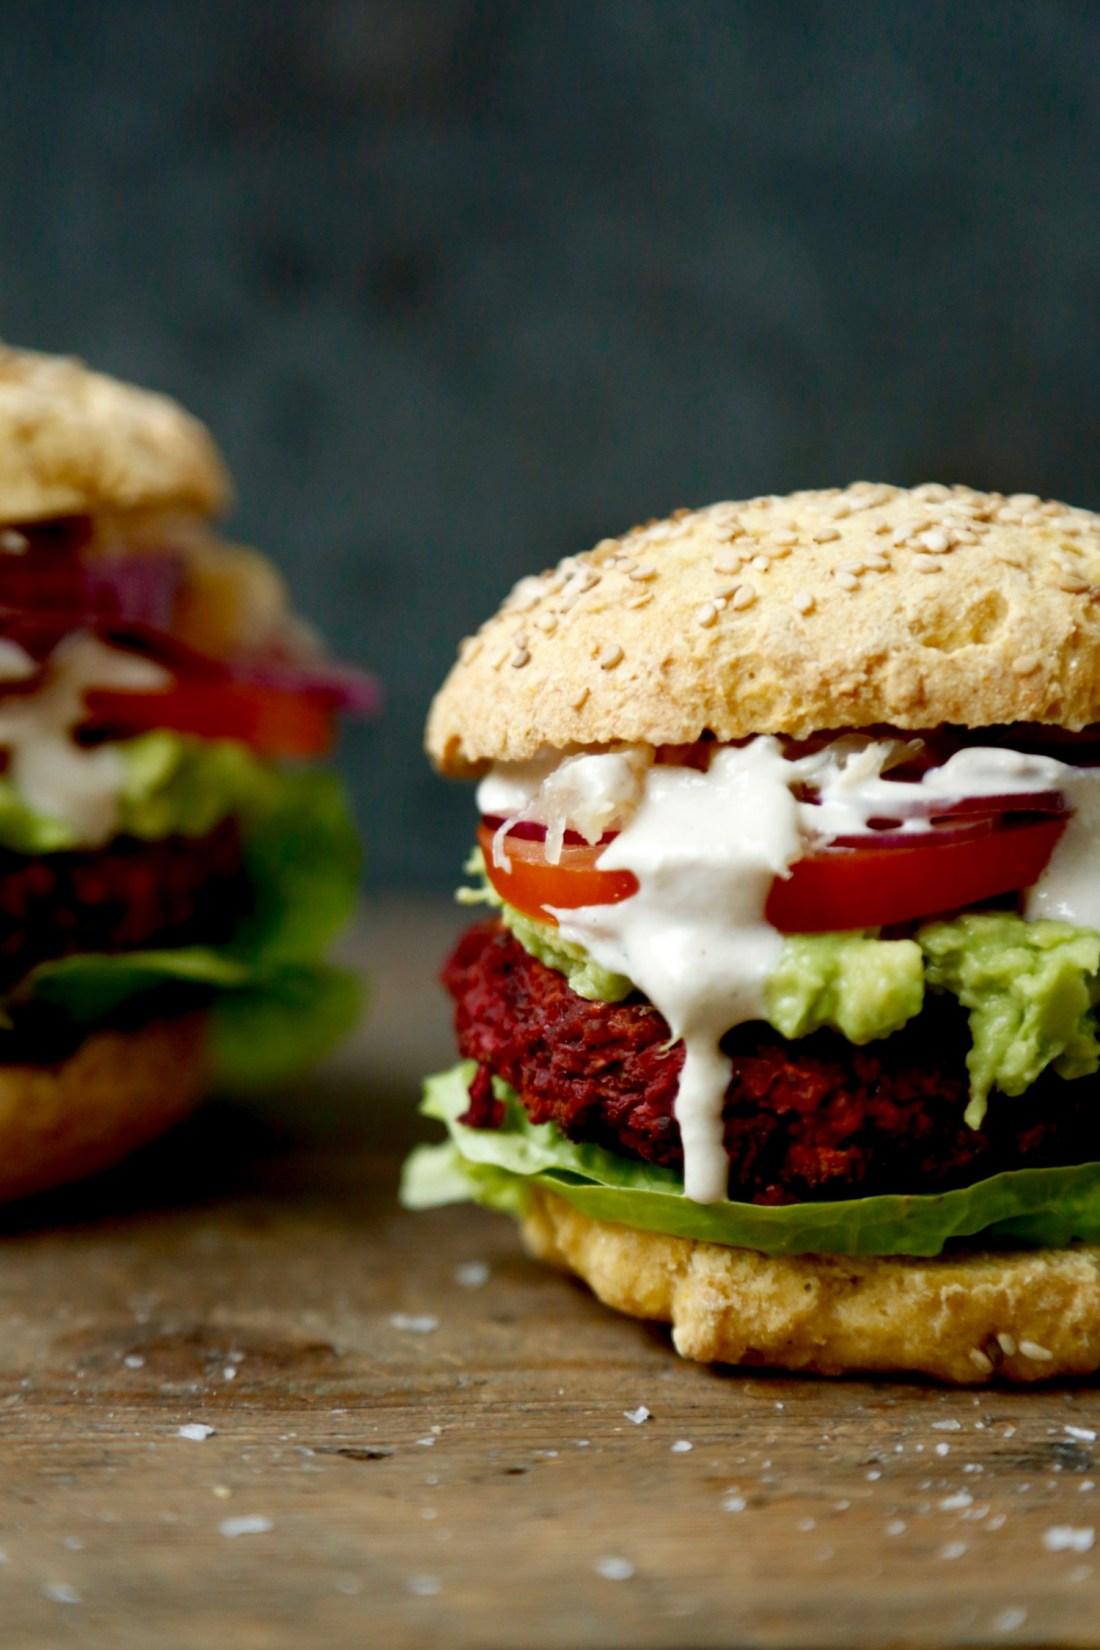 simple-glutenfri-burgerboller-vegansk-opskrift-1